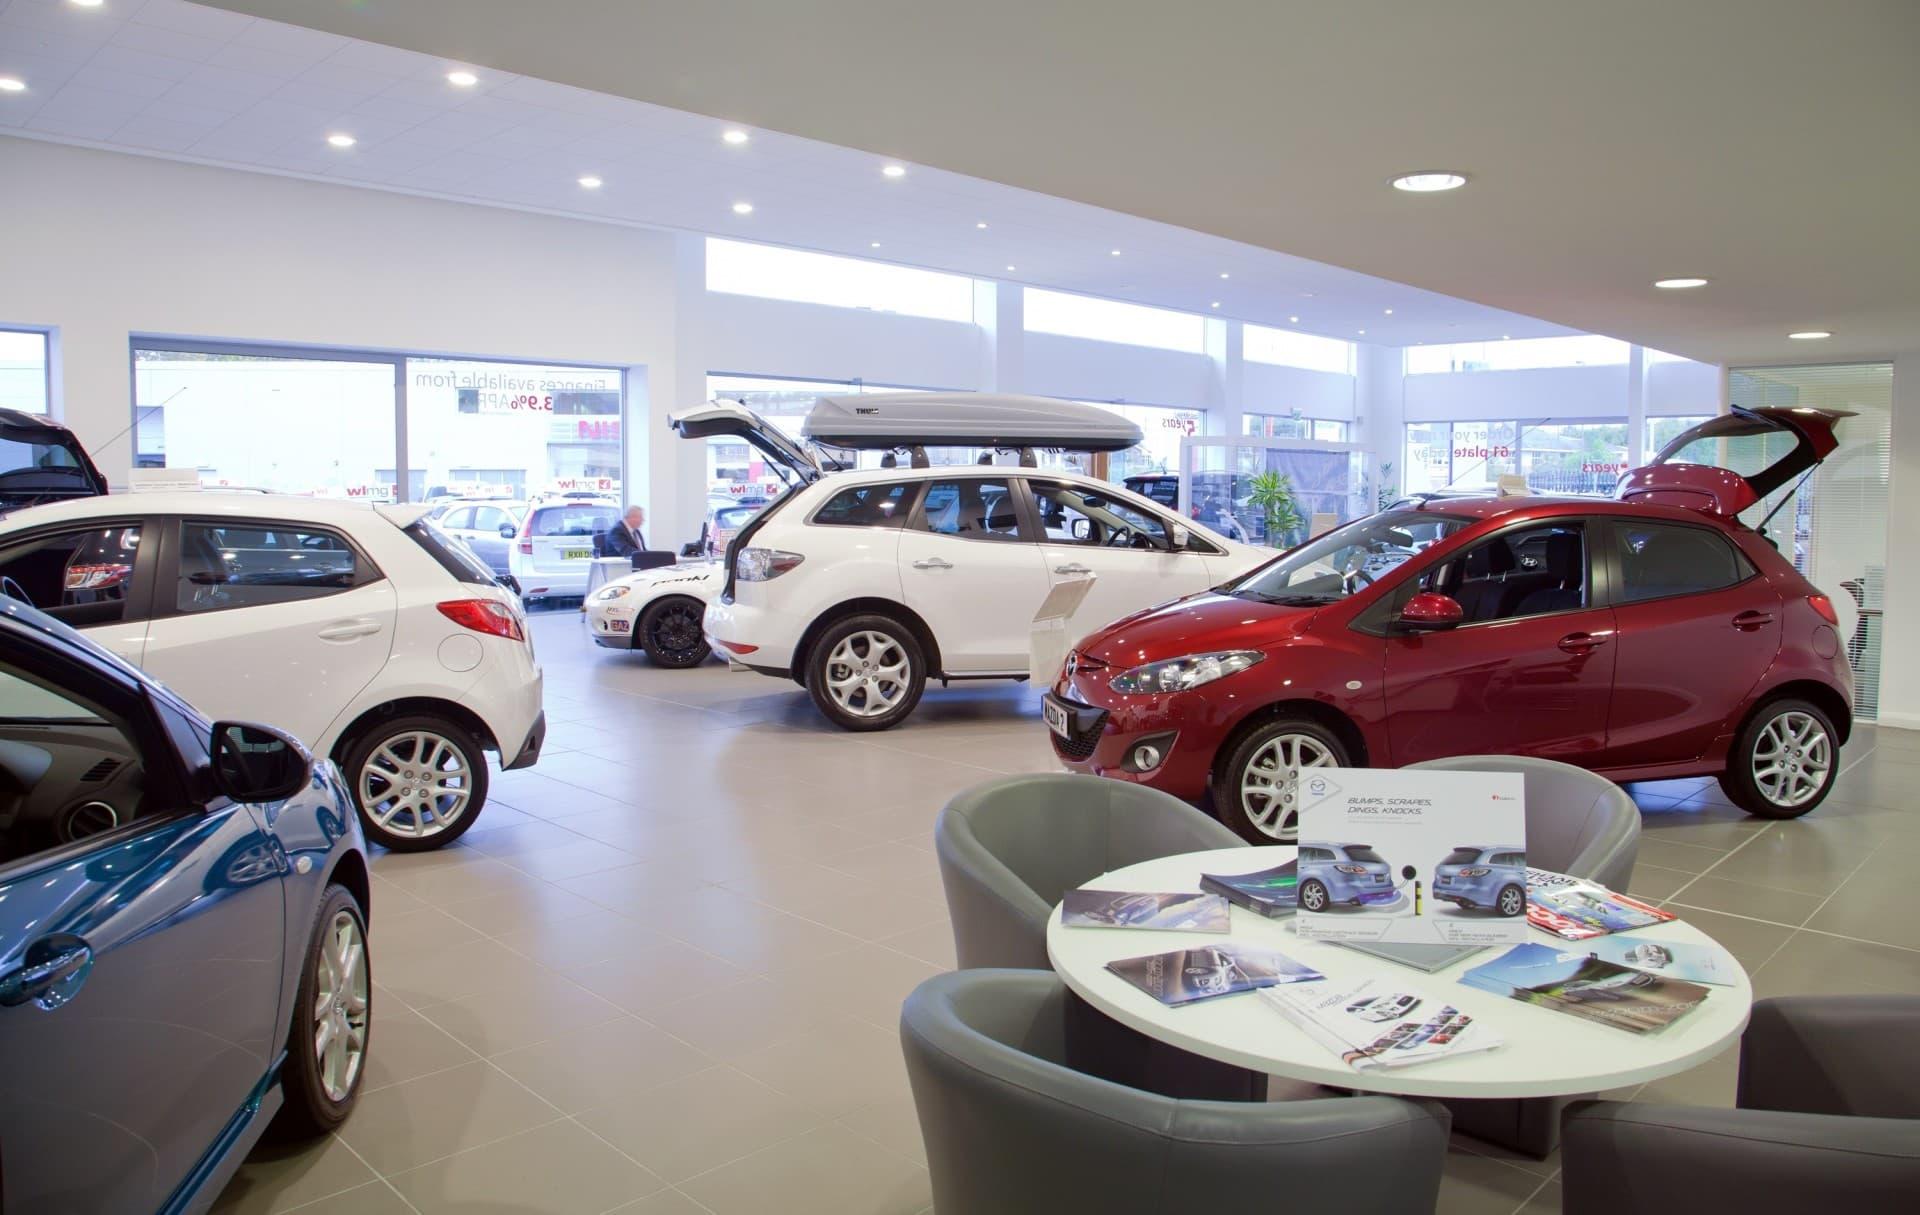 Devolver Coche Comprar Coche Concesionario Mazda